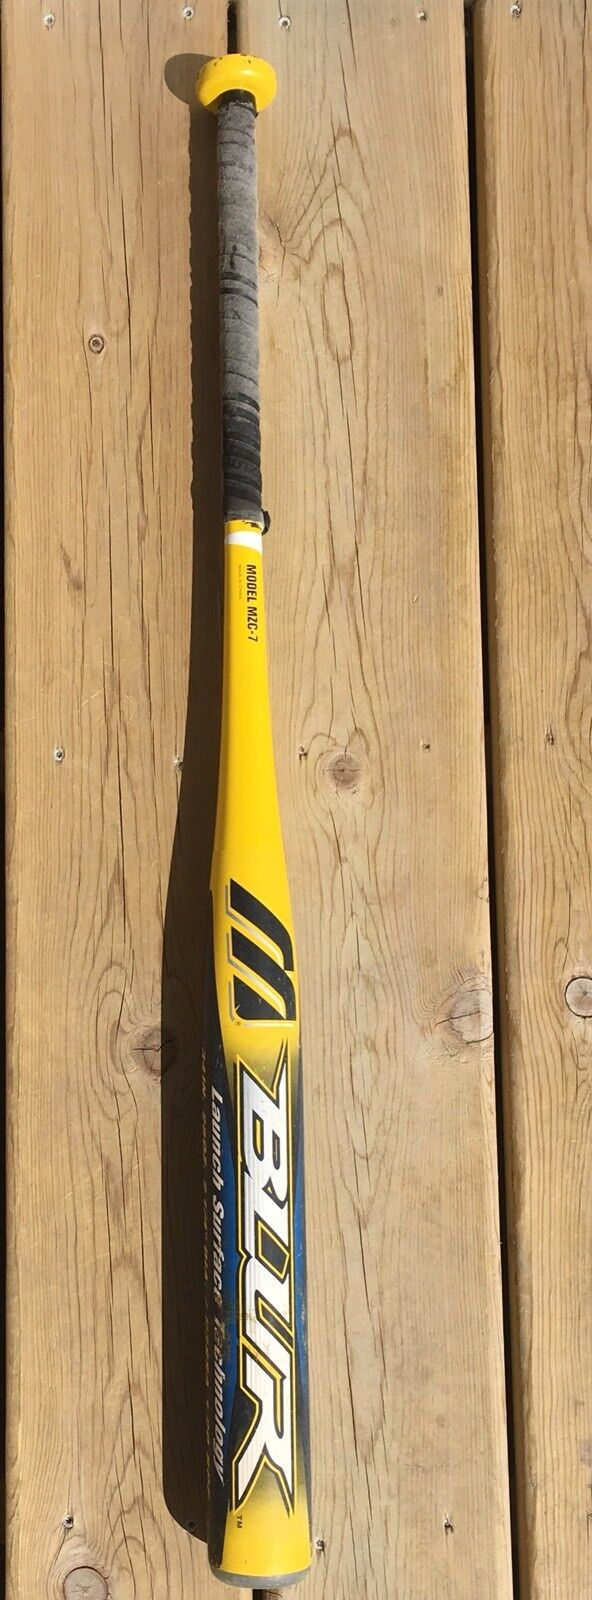 Mizuno Softball Bat bluer Techfire MZC-7 34 28